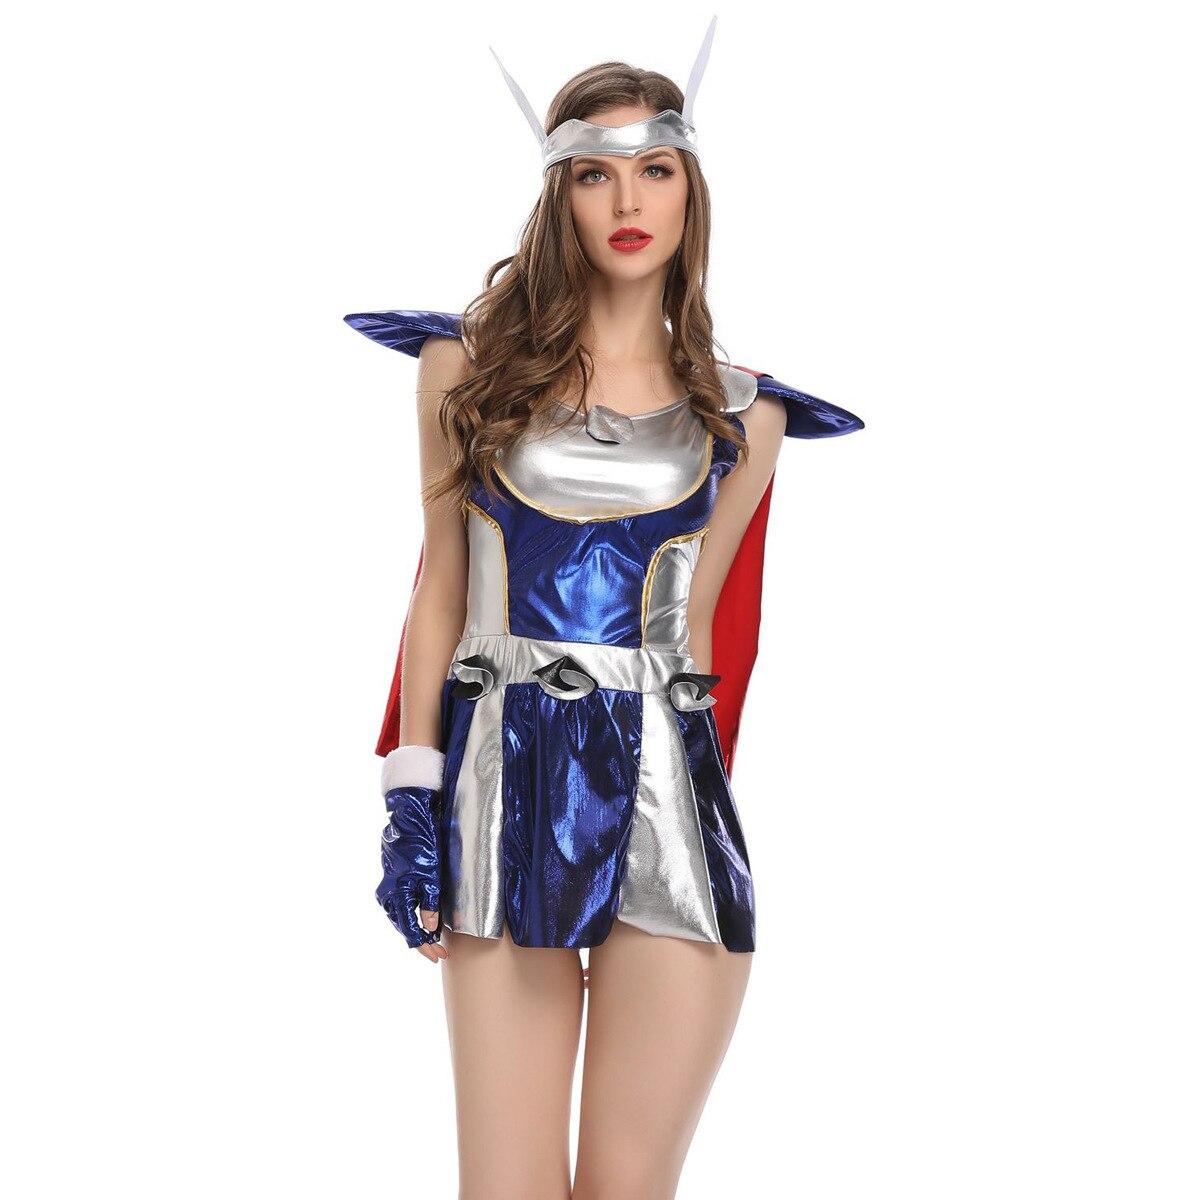 New Halloween Cosplay Adult Cosplay Comic Heroine Superman Raytheon Costume Cosplay Women